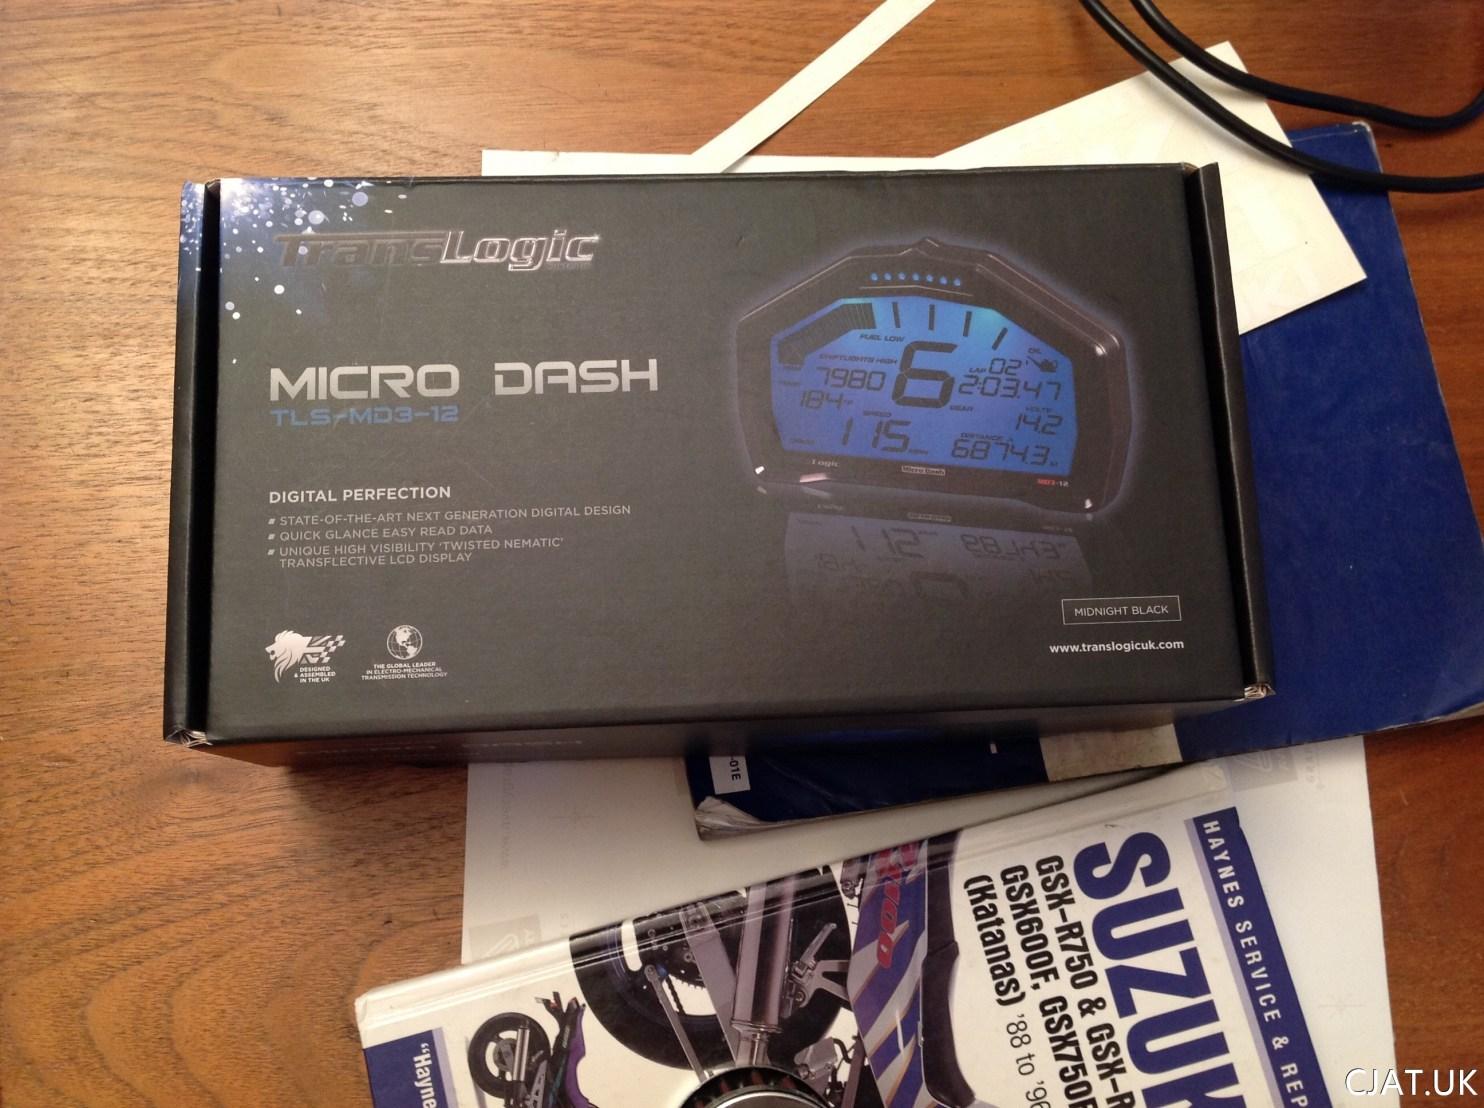 Translogic Microdash 3